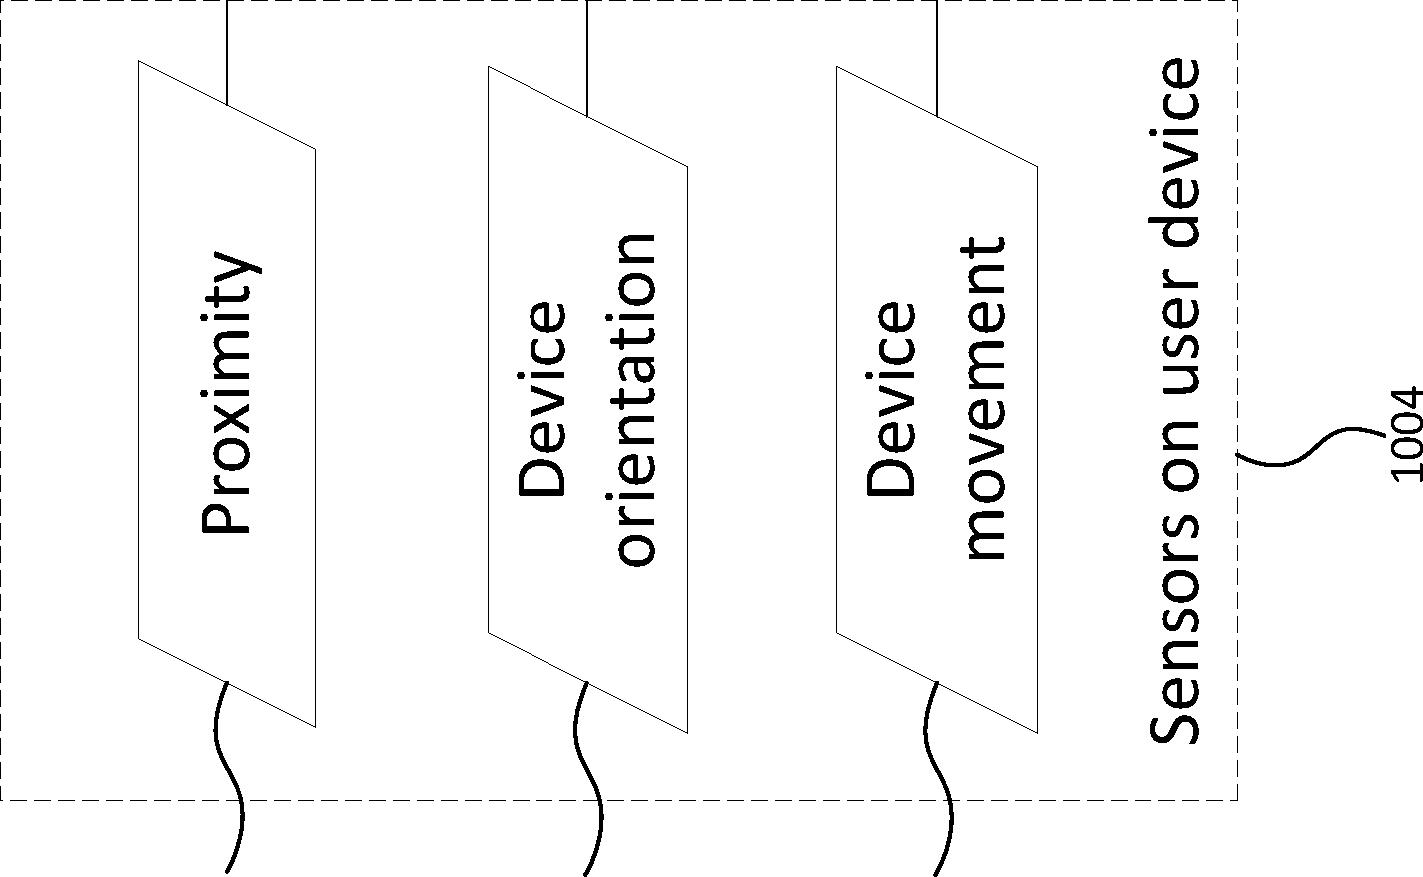 Figure GB2560340A_D0016